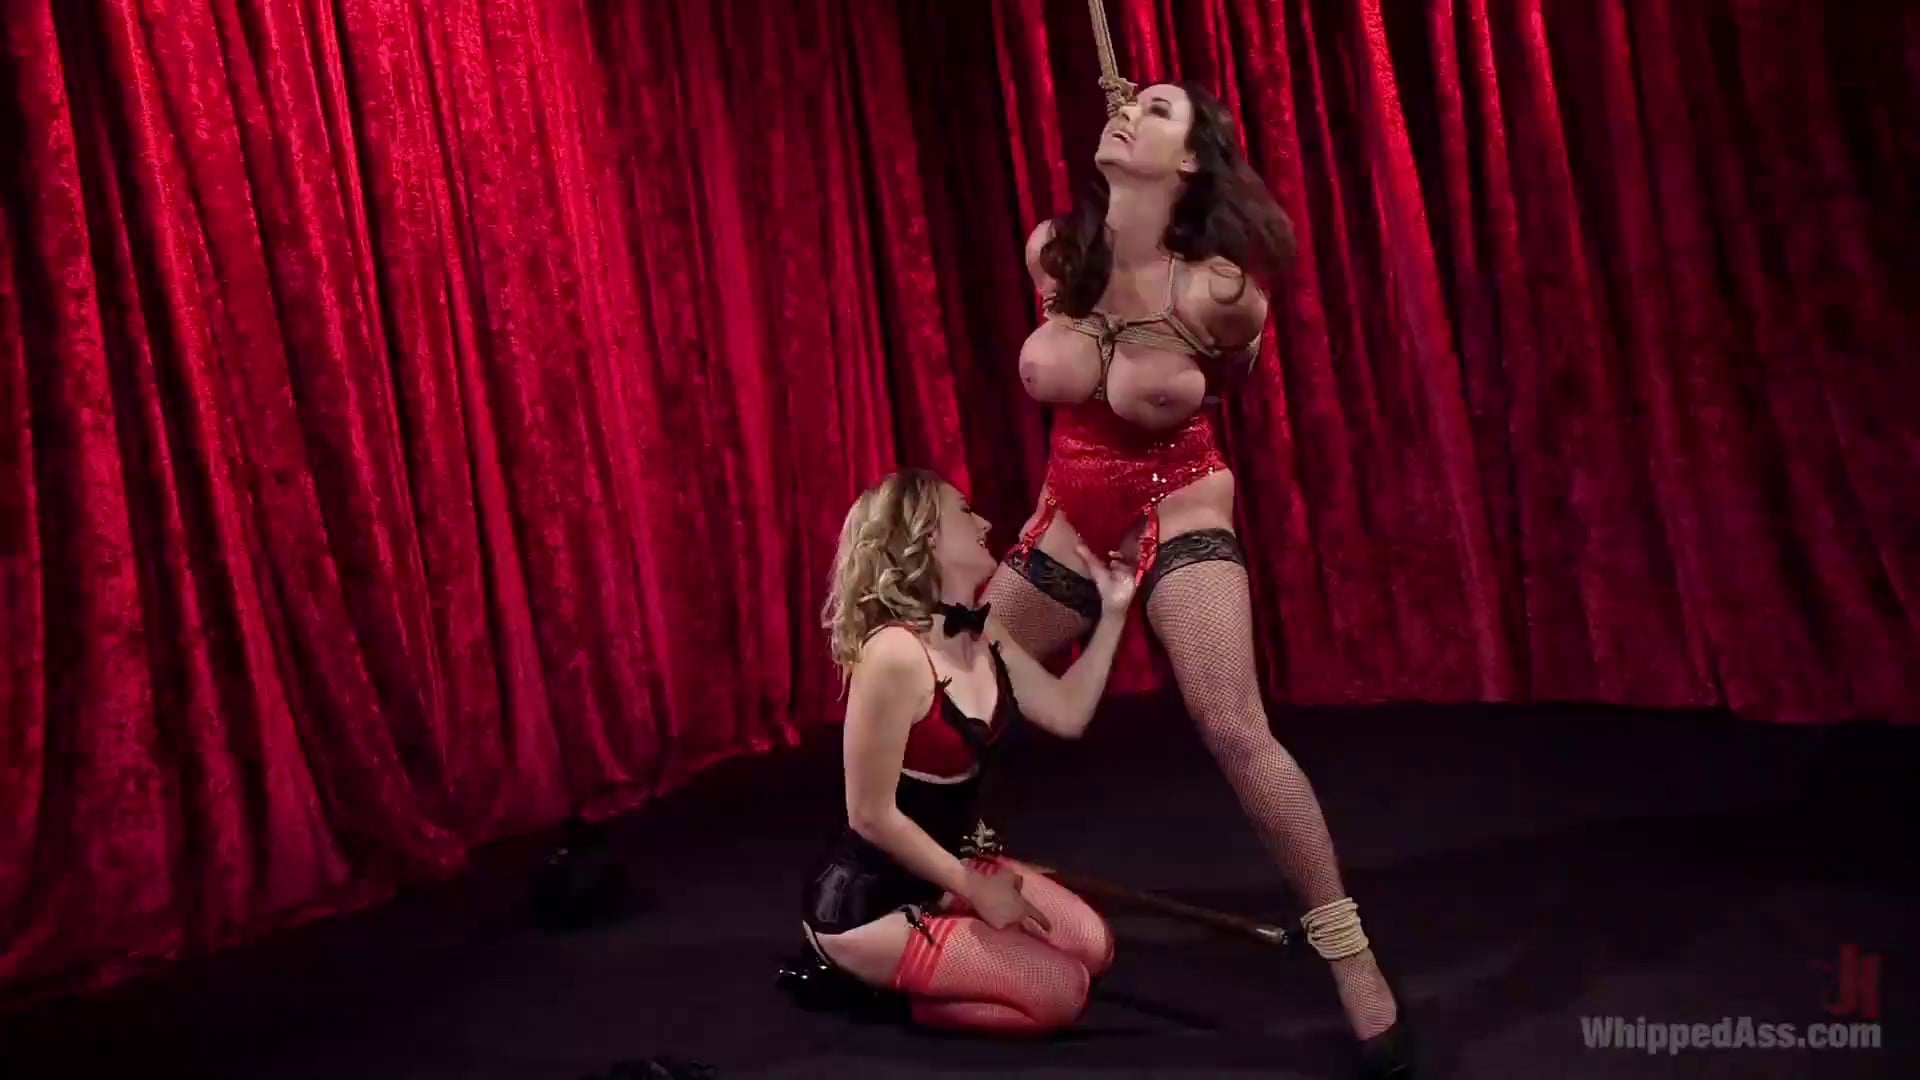 jessica logan naked porn pics